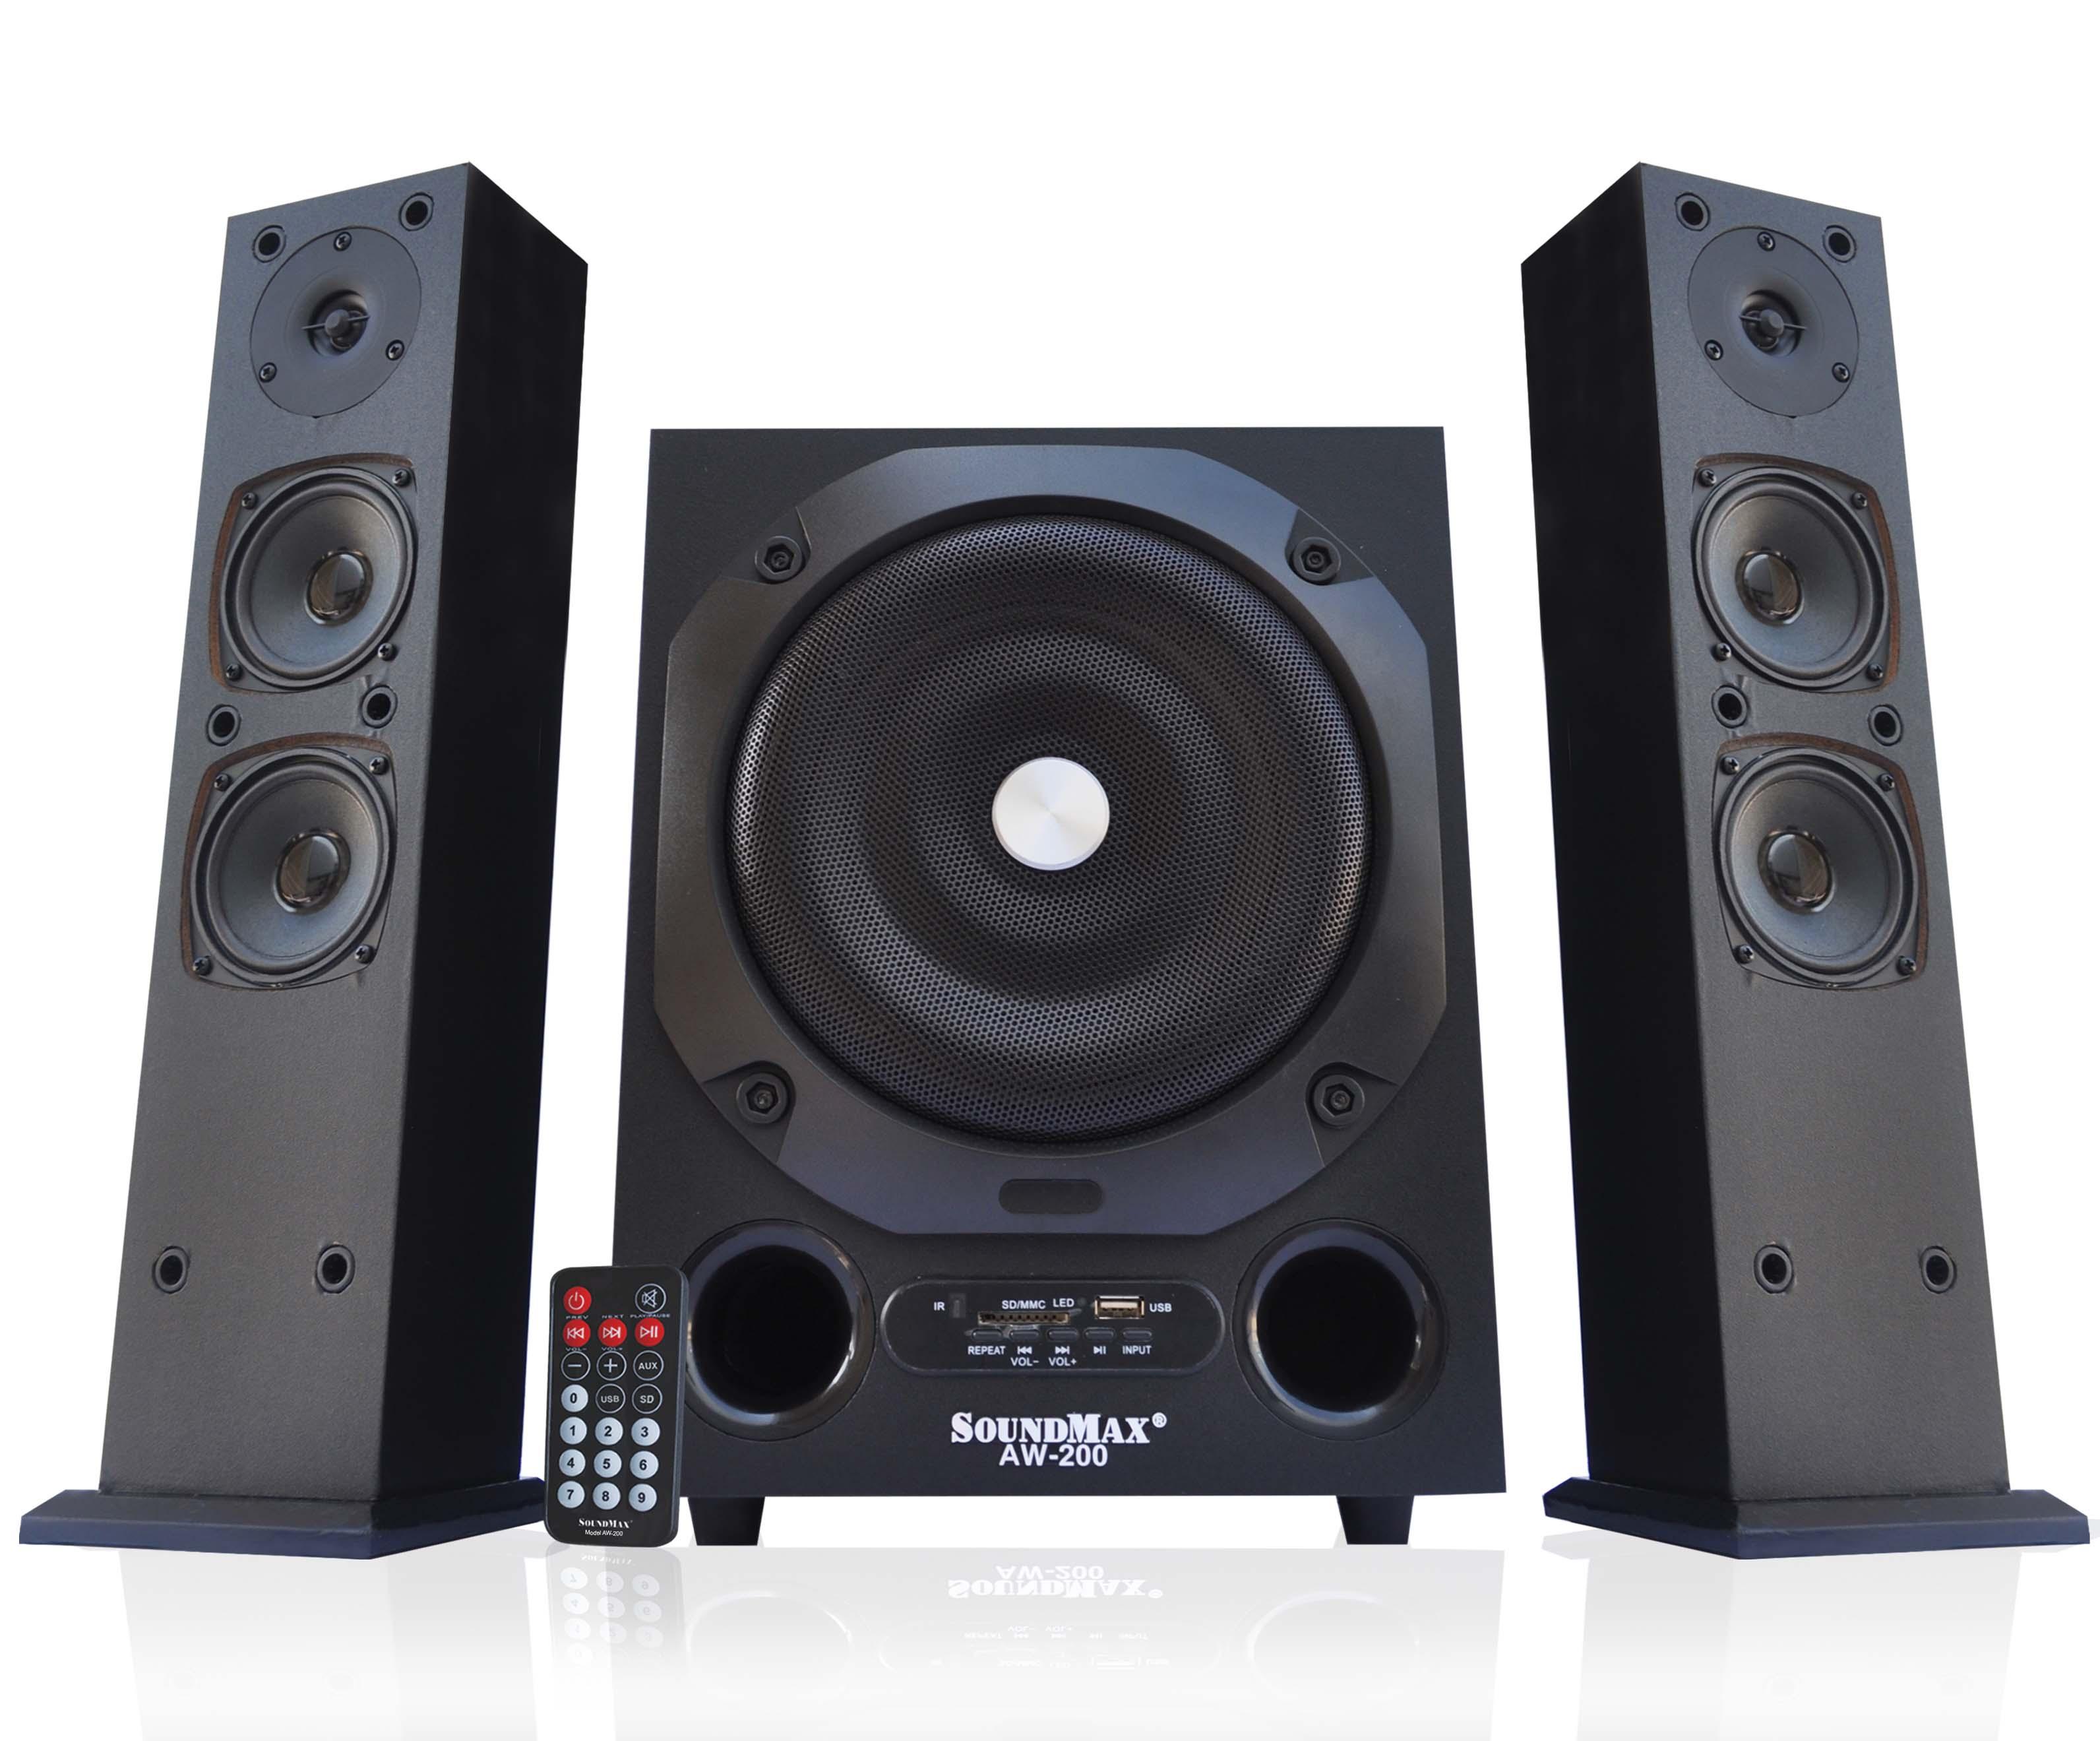 Loa SoundMax AW200/2.1